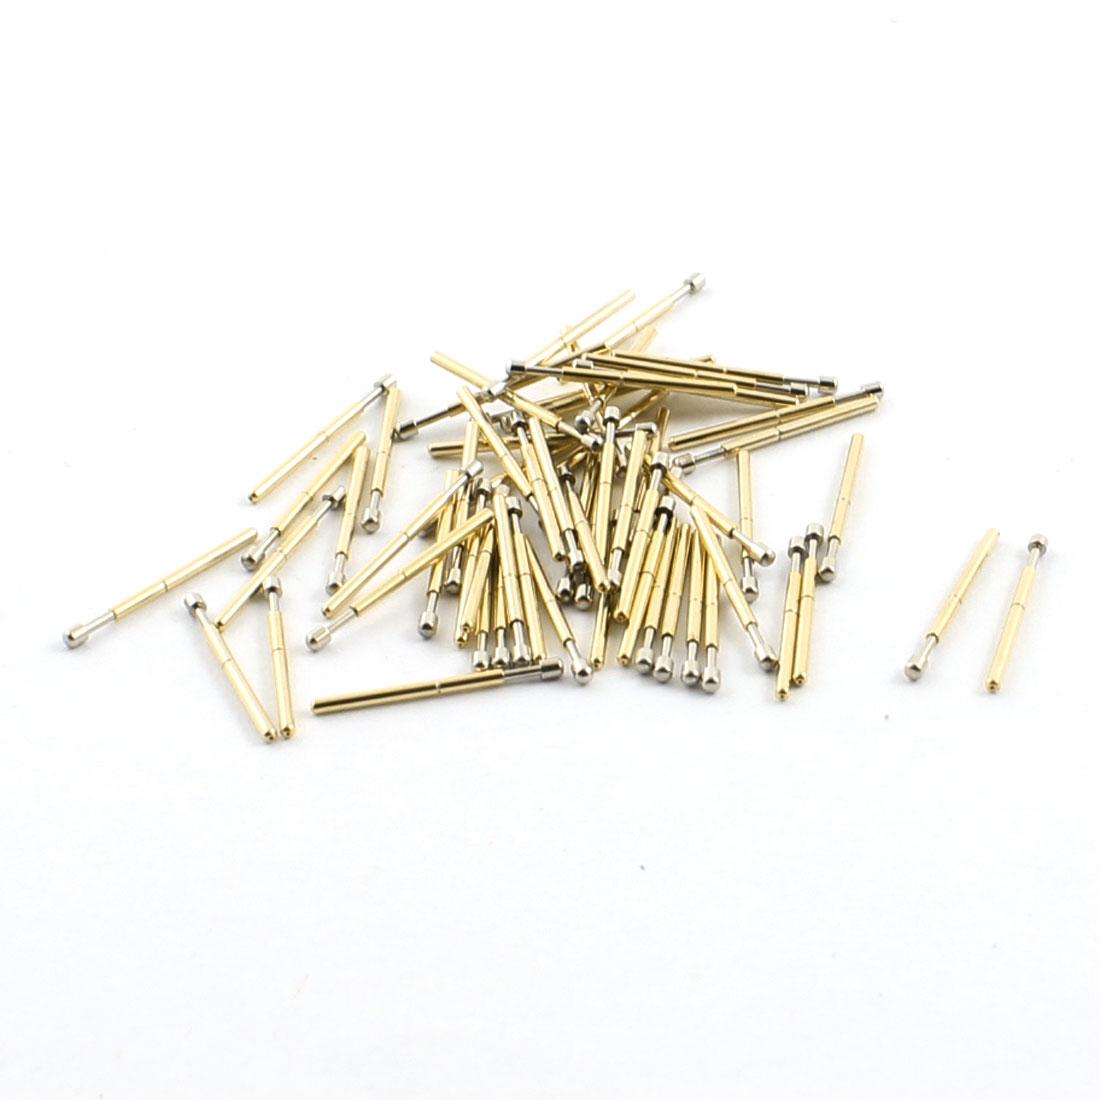 100PCS Spring Test Probes Testing Pins 1.3mm Round Spherical Tip 16.5mm P75-D